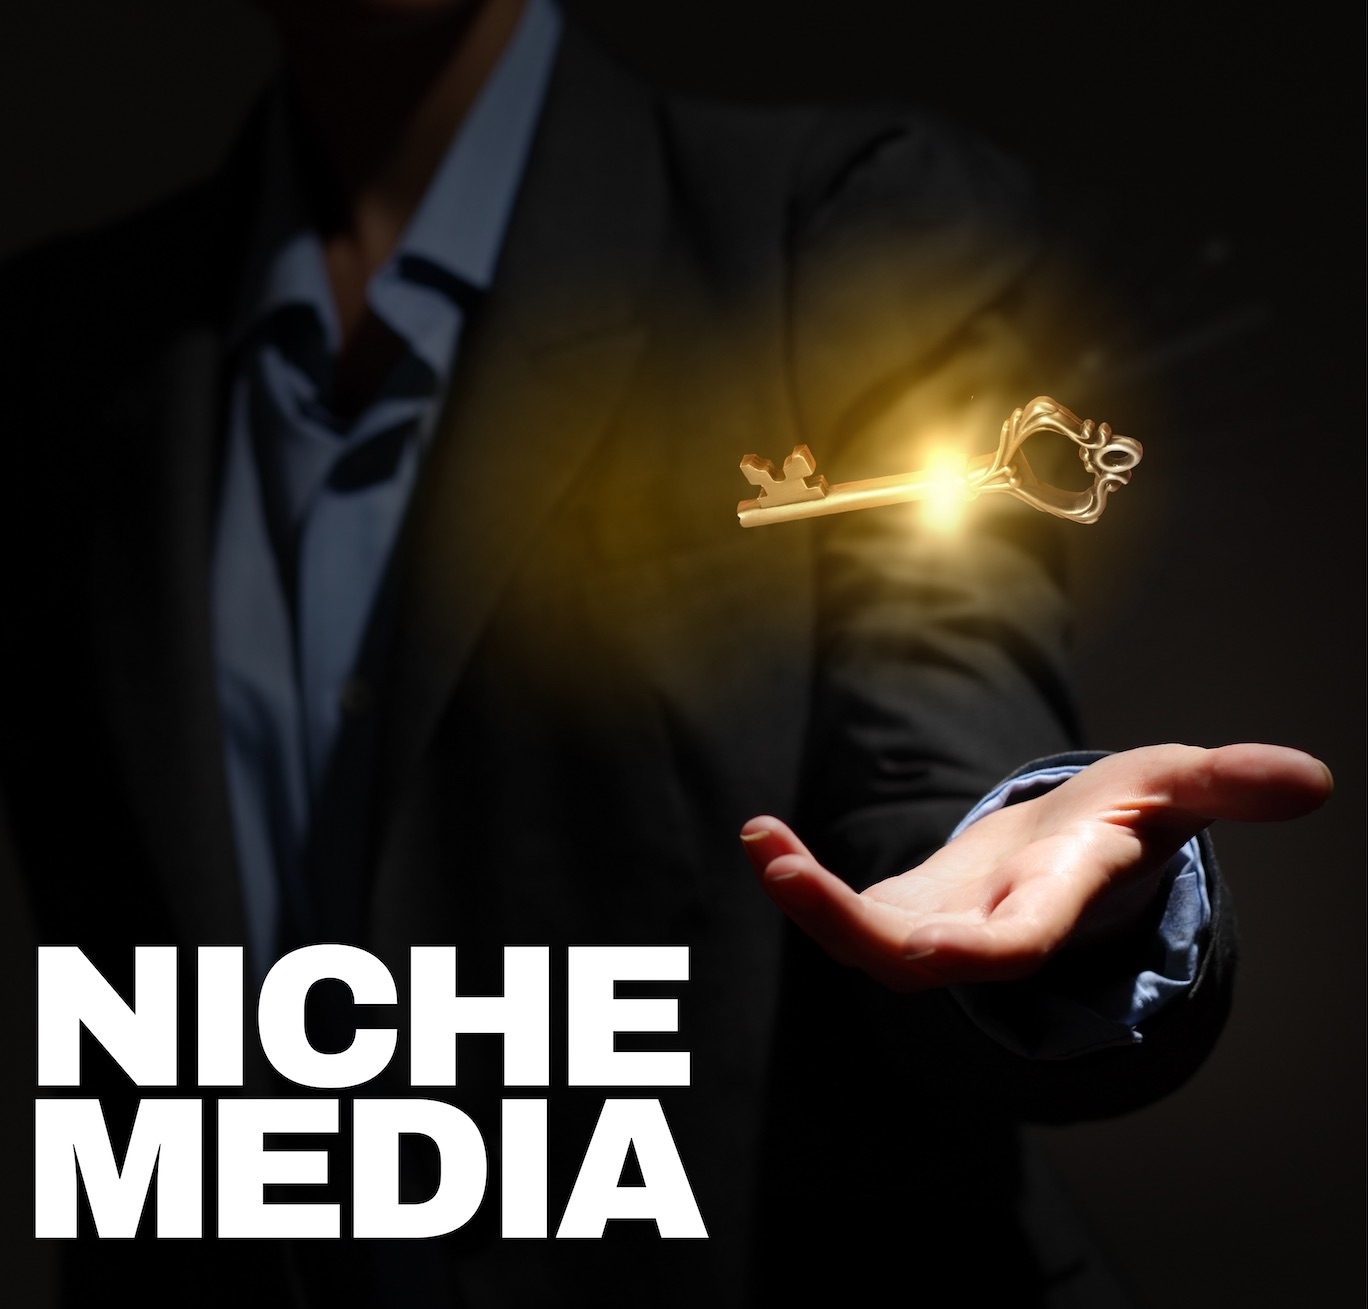 Niche Media key